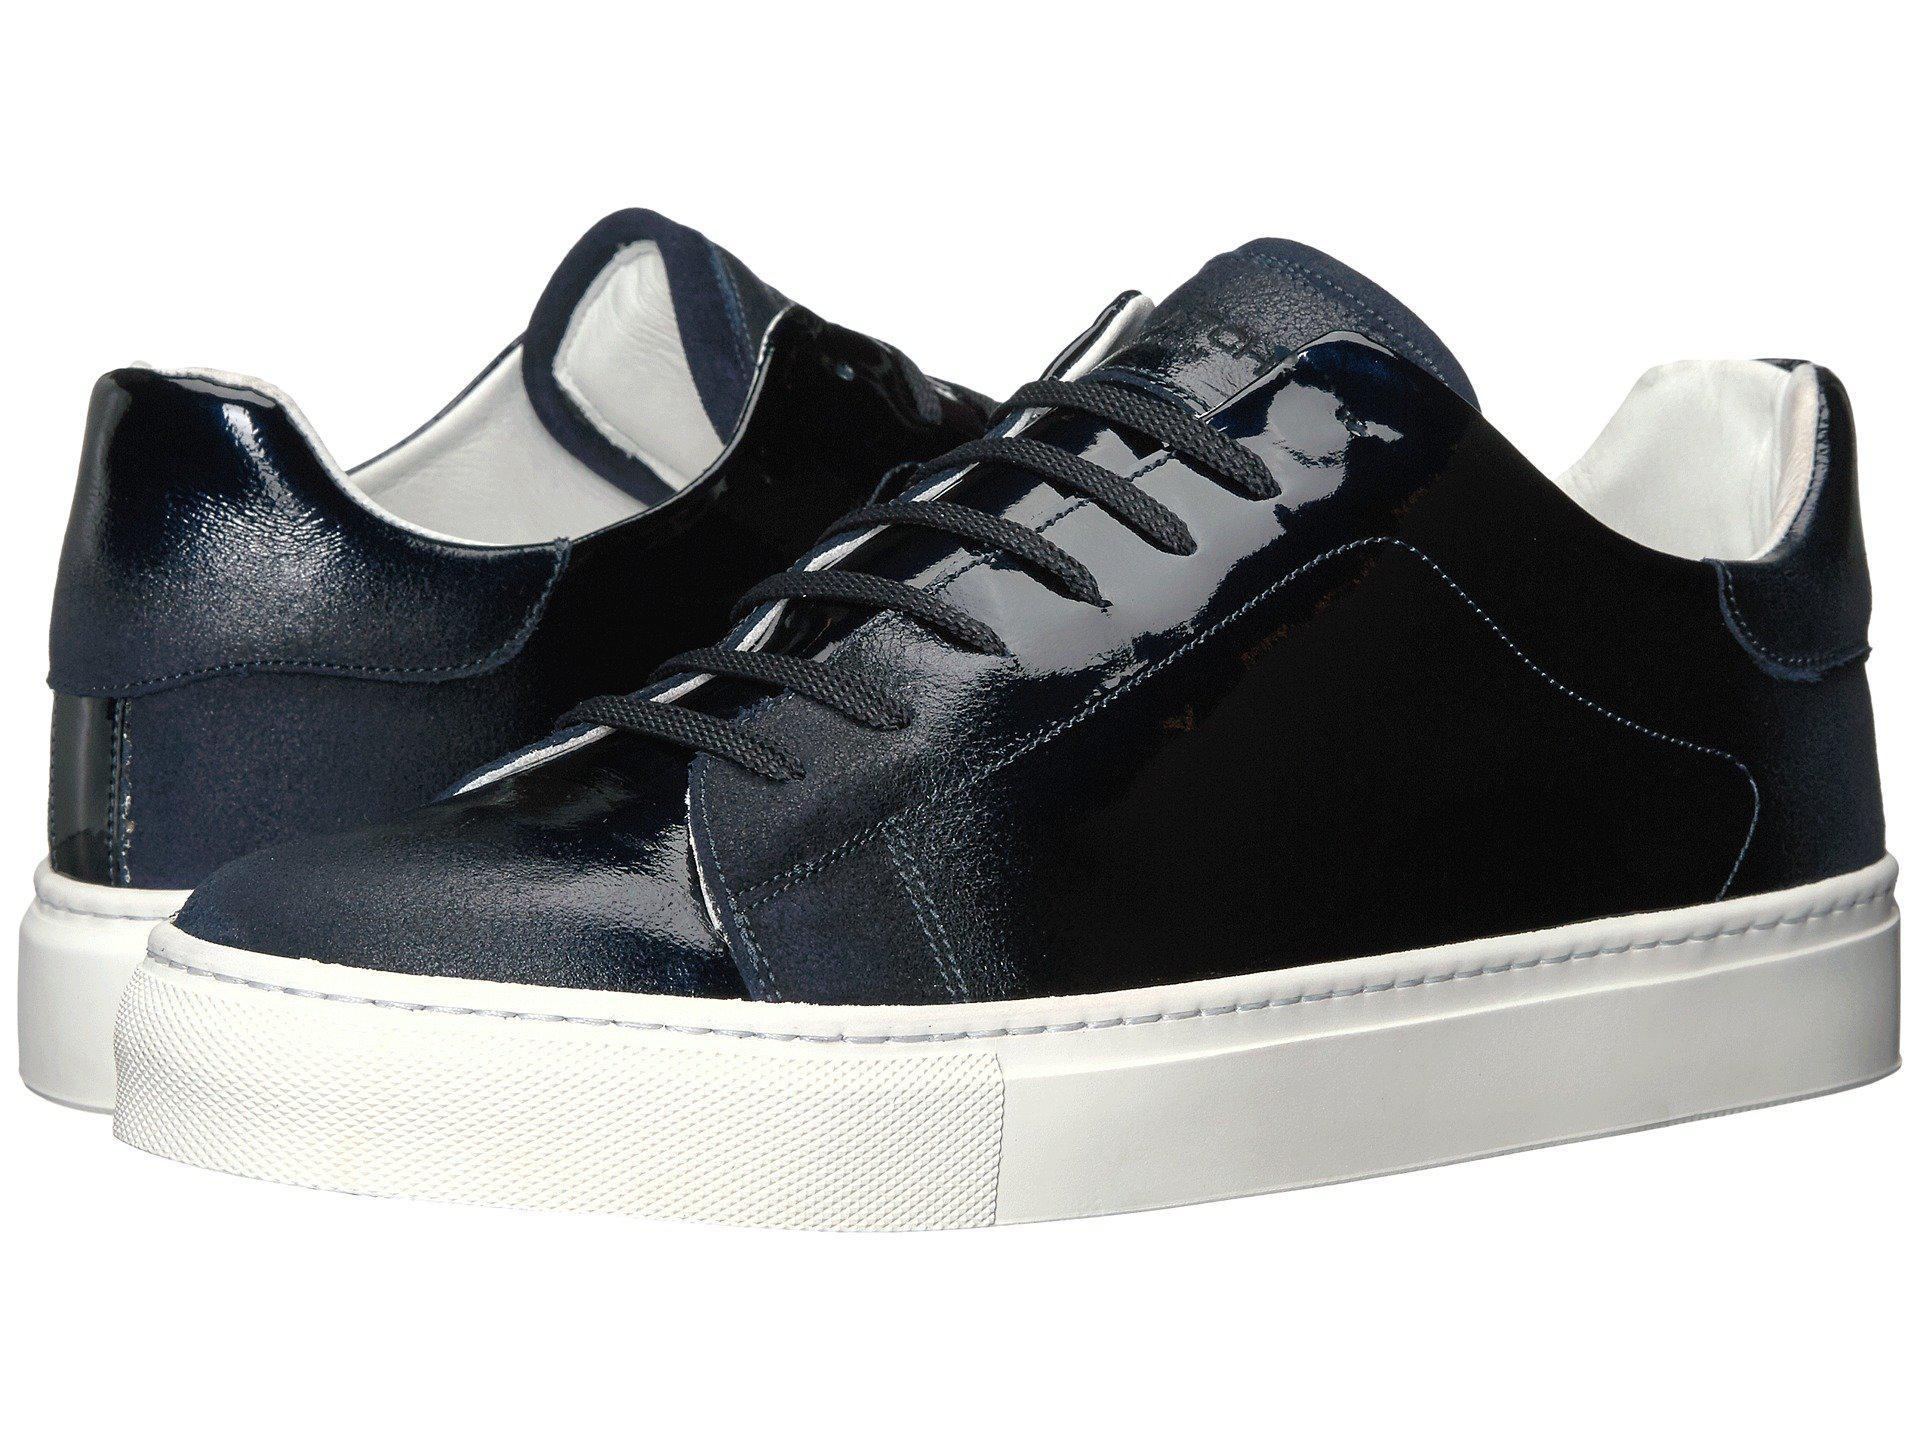 24e75405f584 Lyst - Bugatchi South Beach Sneaker in Blue for Men - Save 12%